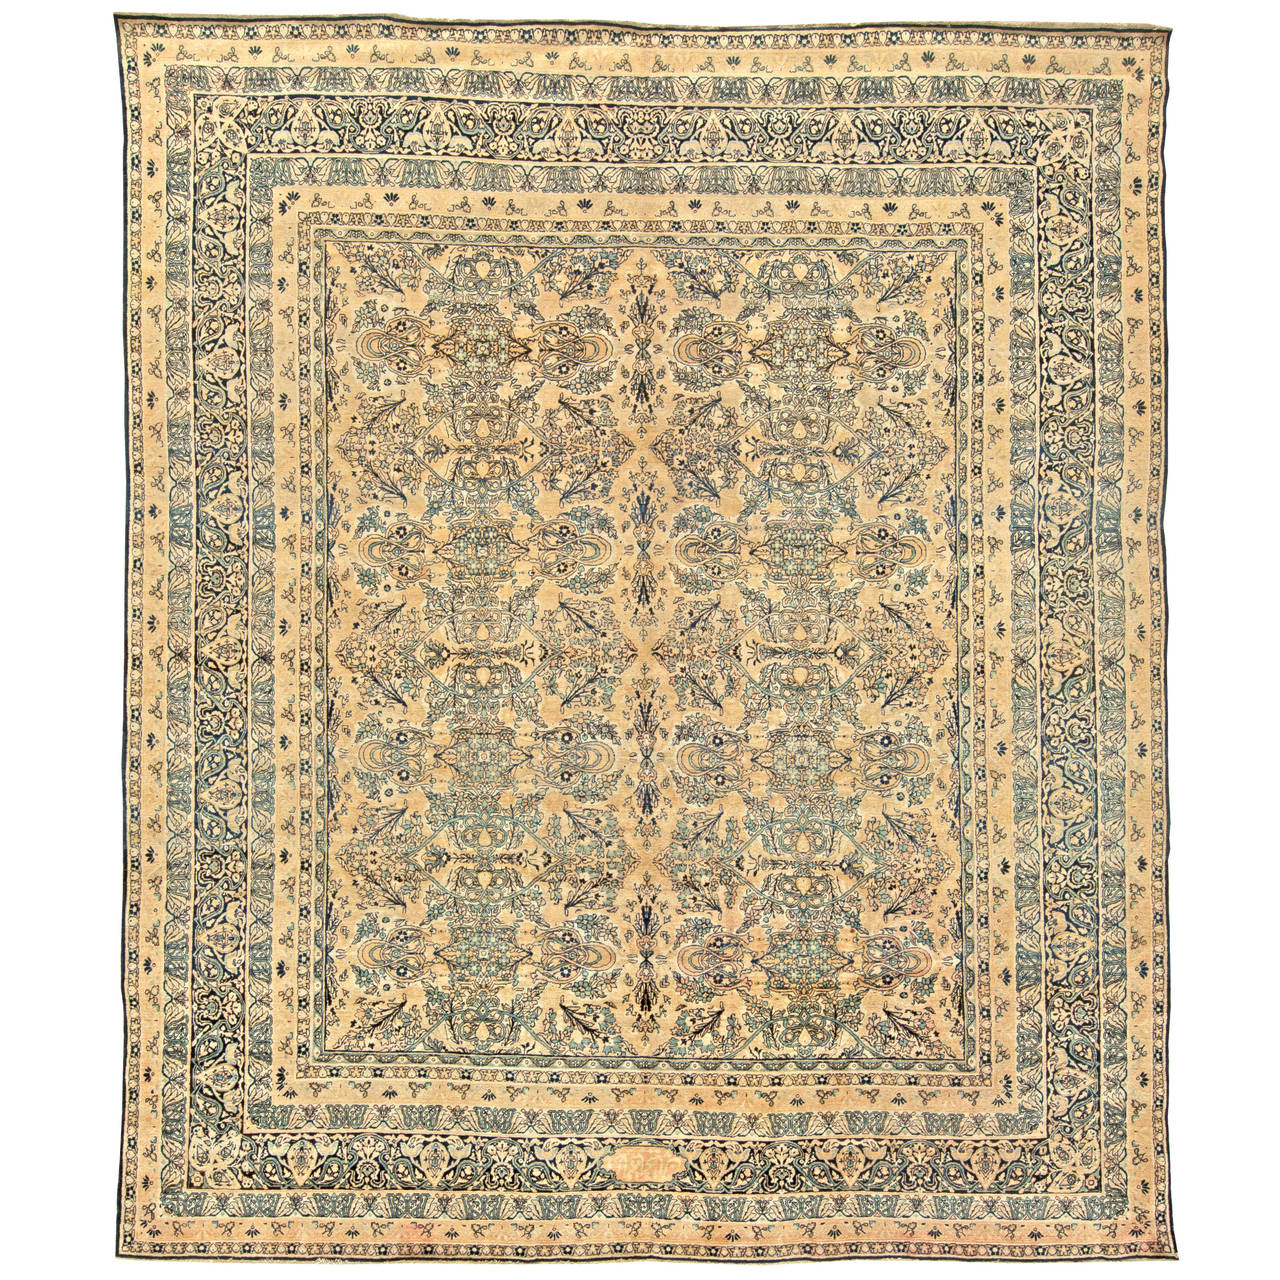 Antique Persian Kirman Rug, circa 1900